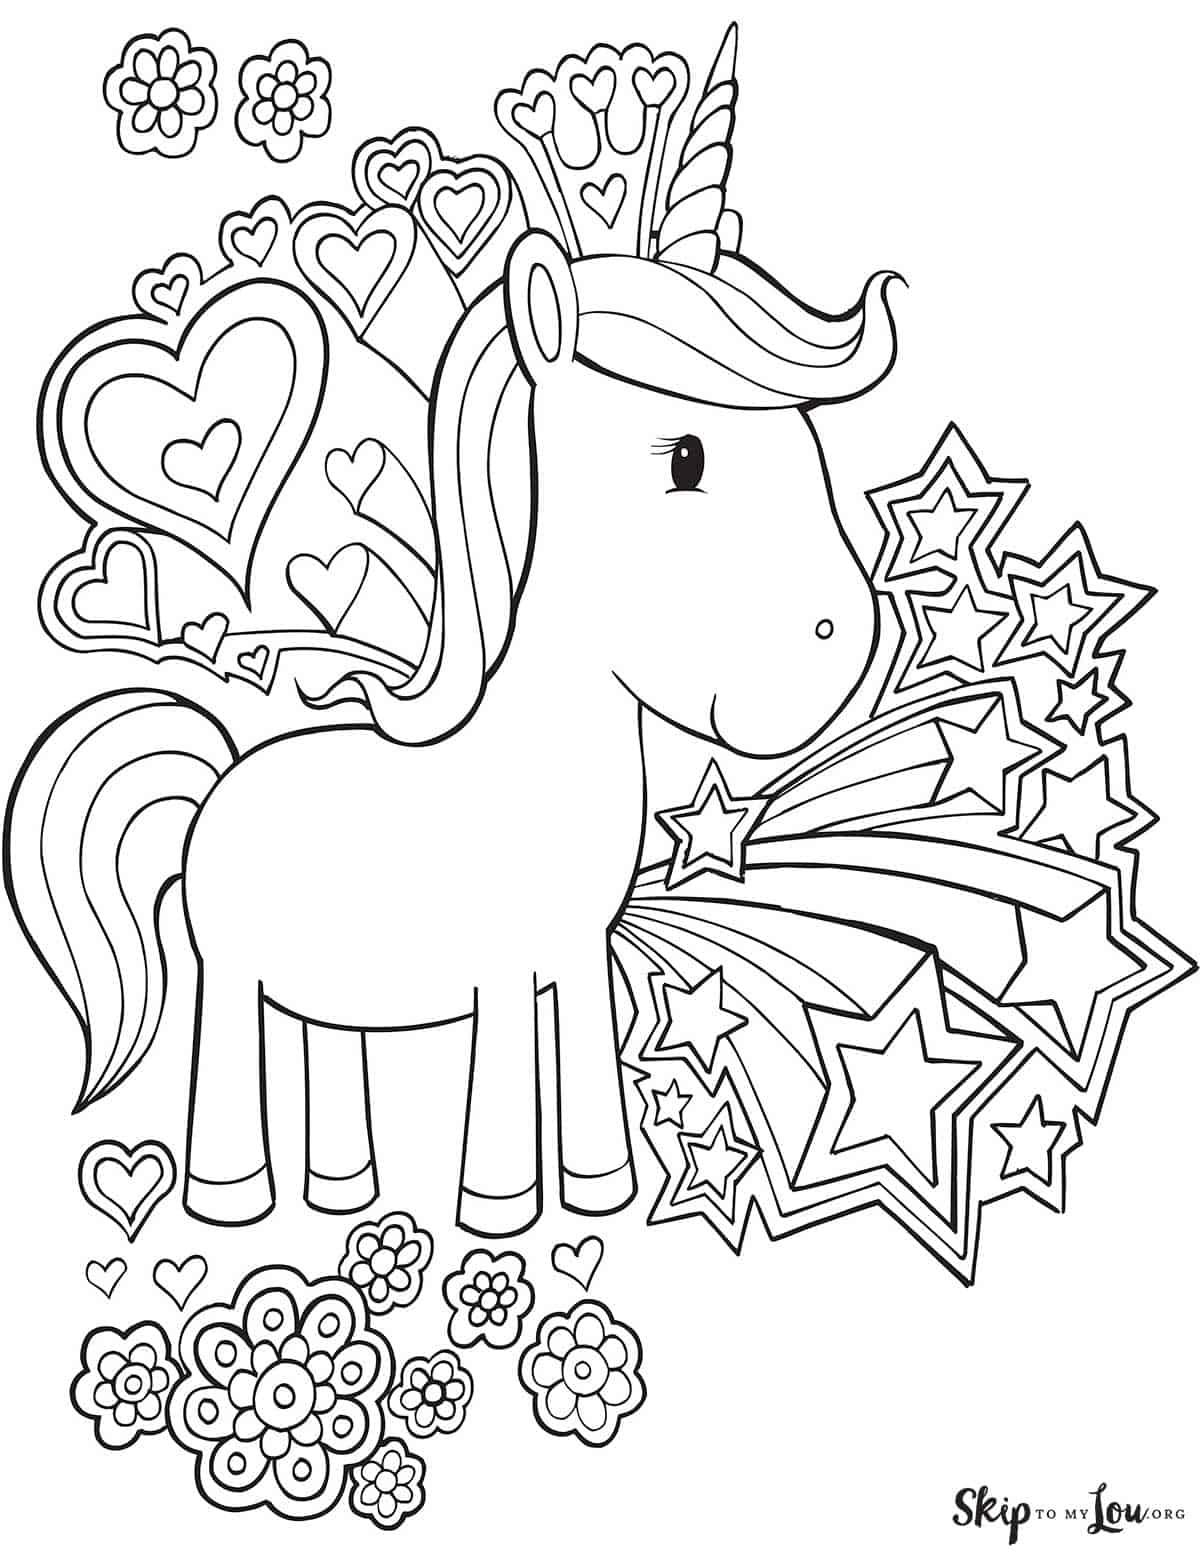 unicorn wearing a crown